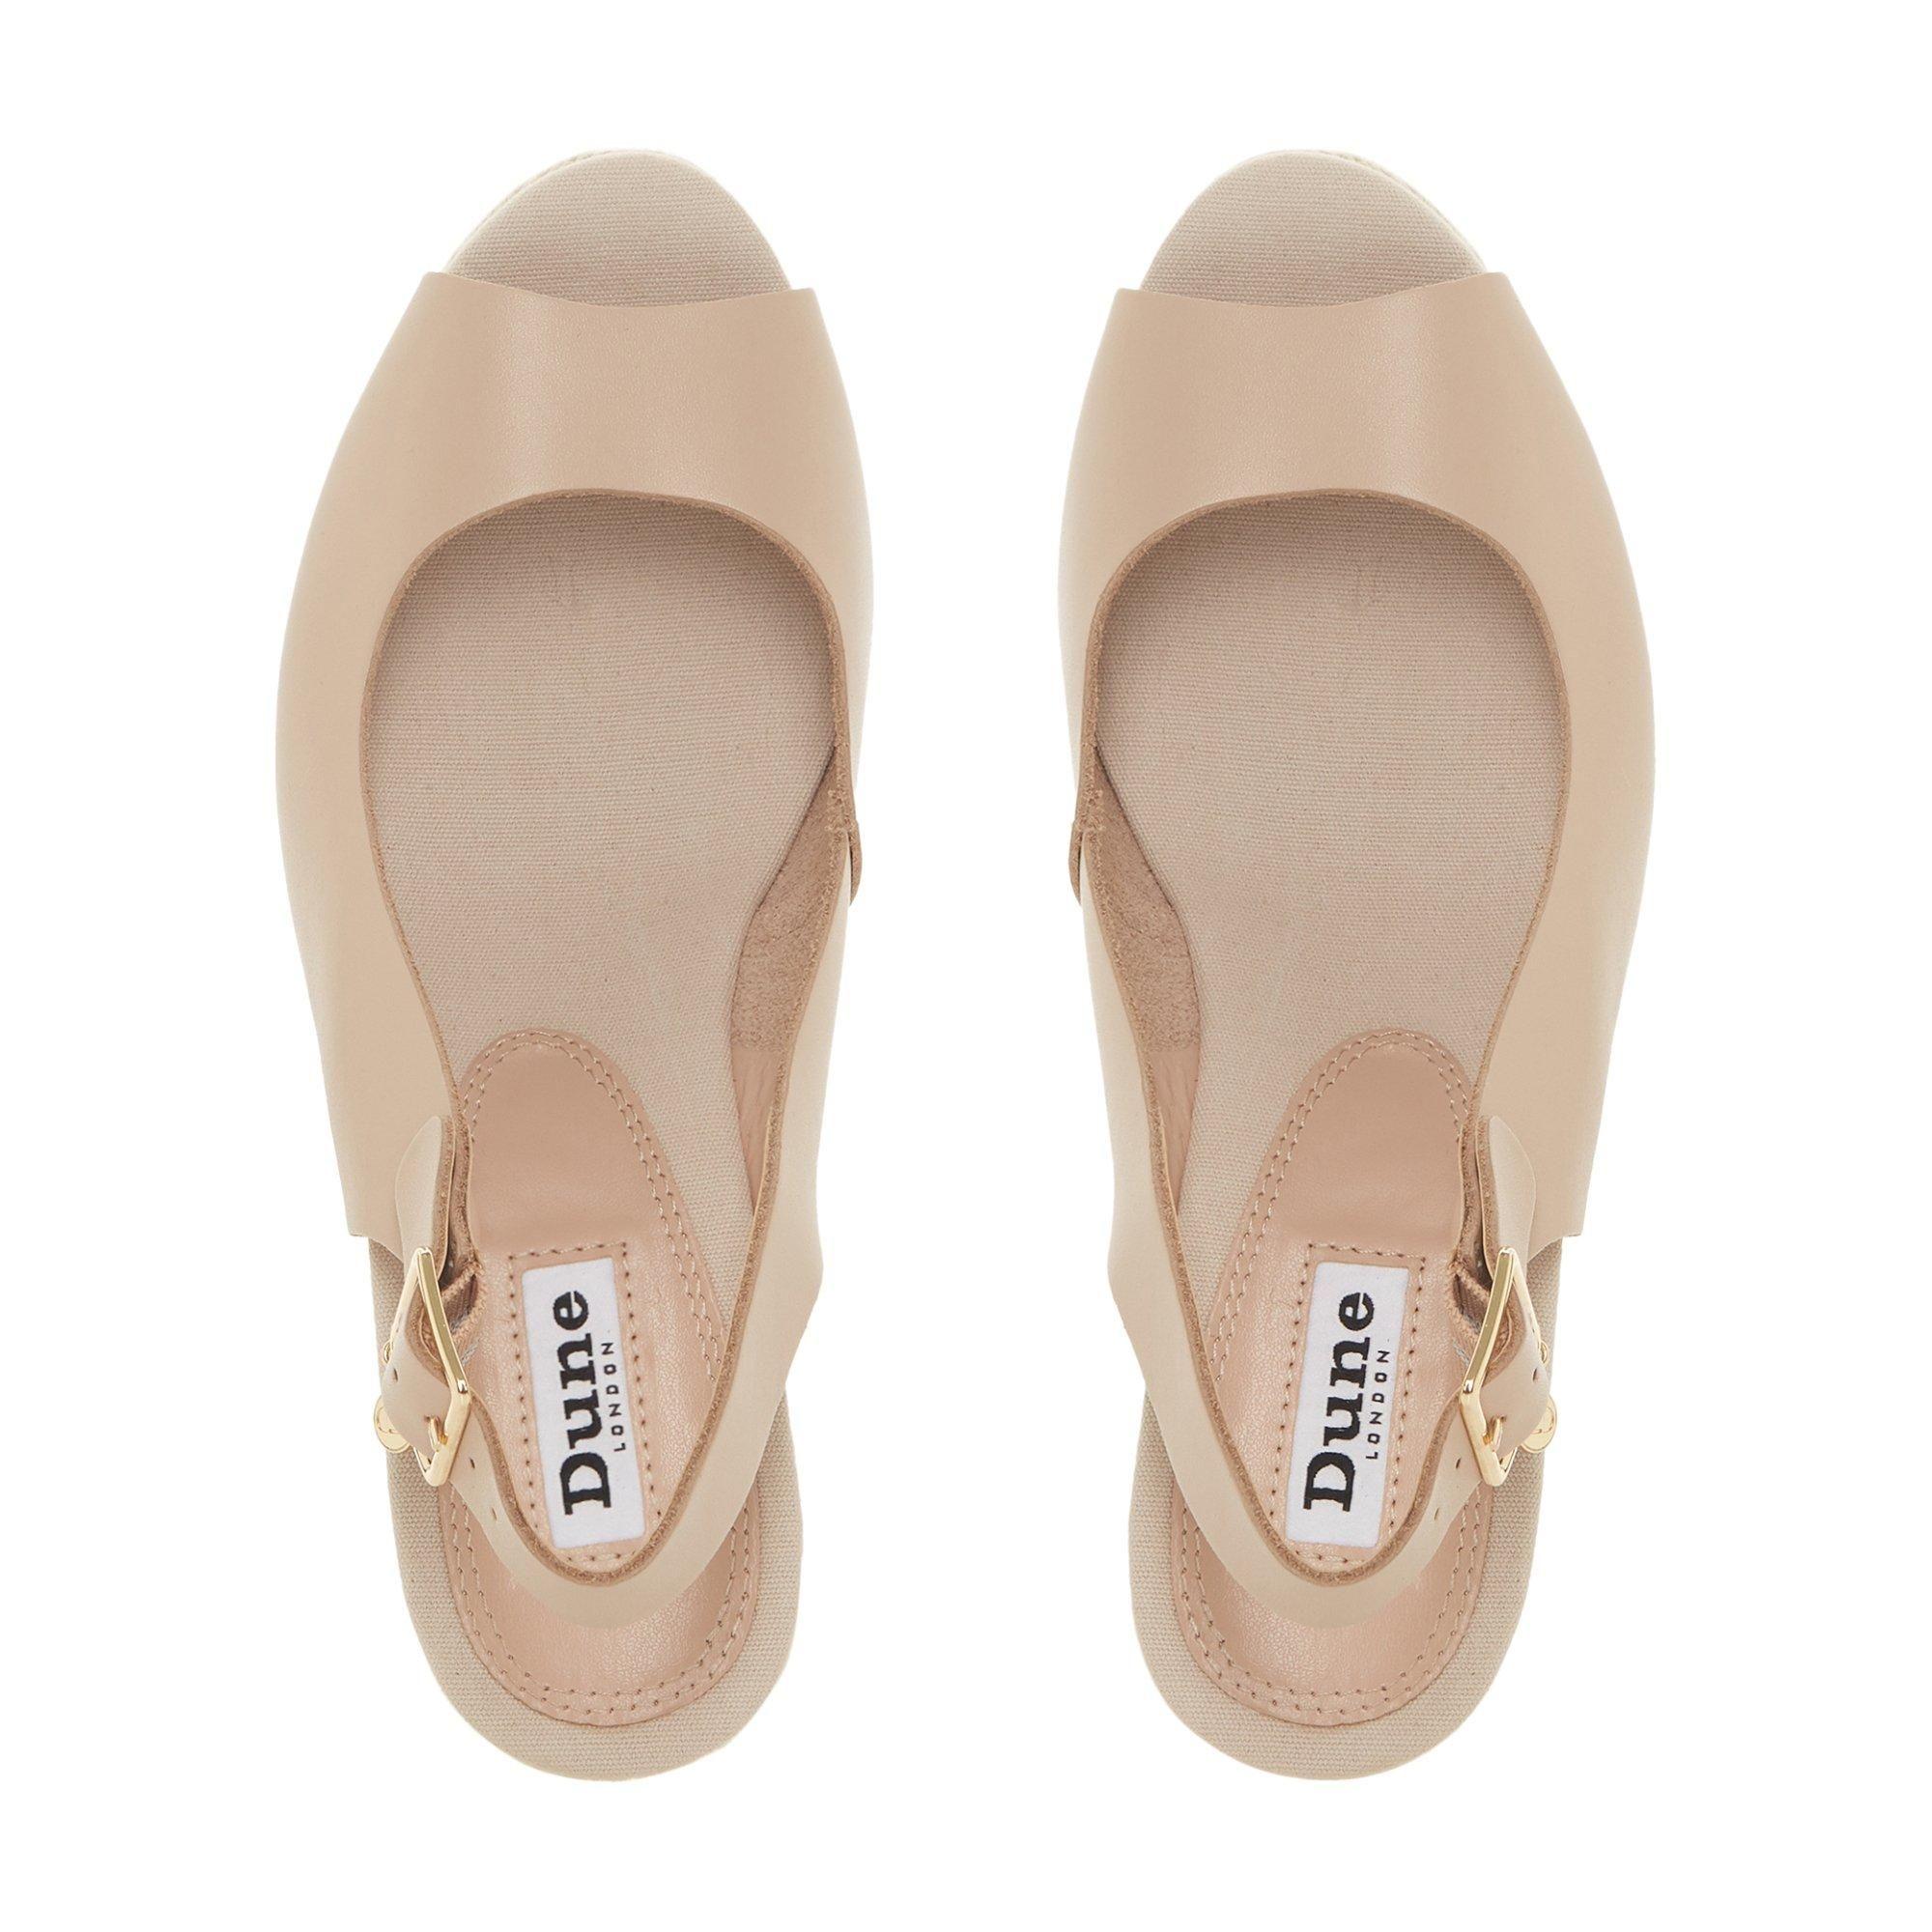 Dune Ladies KICKS Espadrille Wedge Heel Sandal